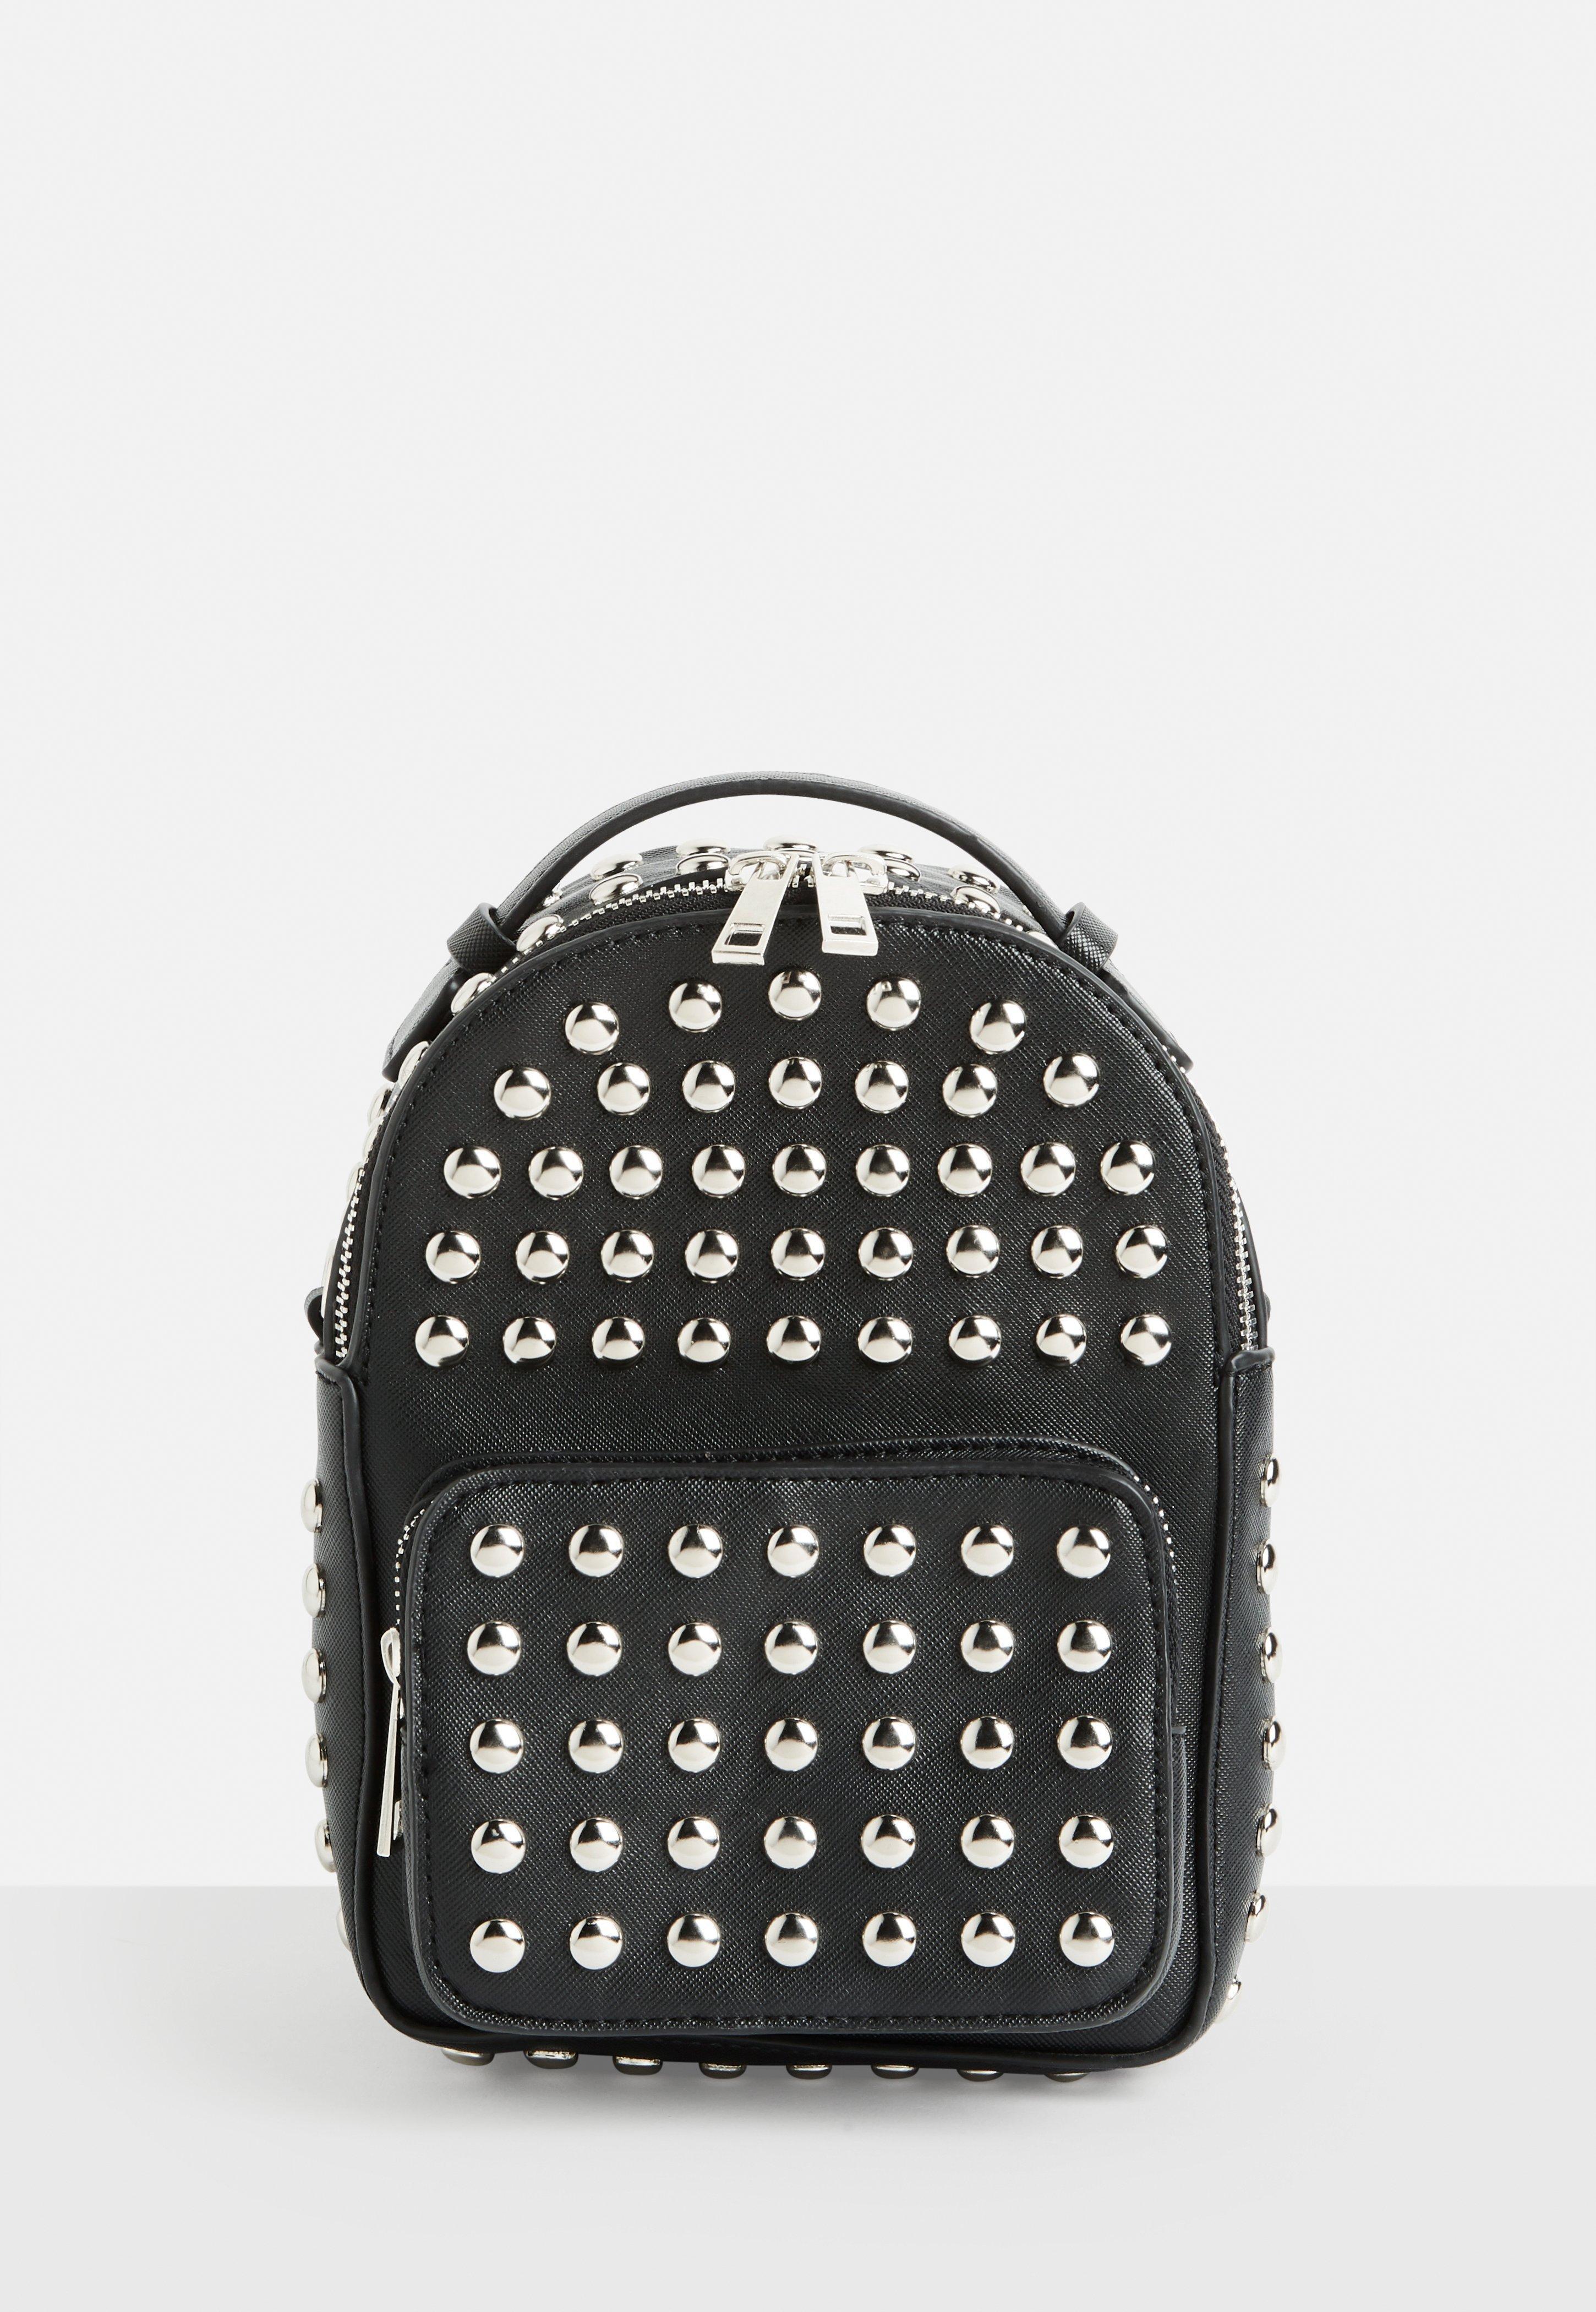 Lyst - Missguided Black Studded Mini Backpack in Black fcf33317abf9e